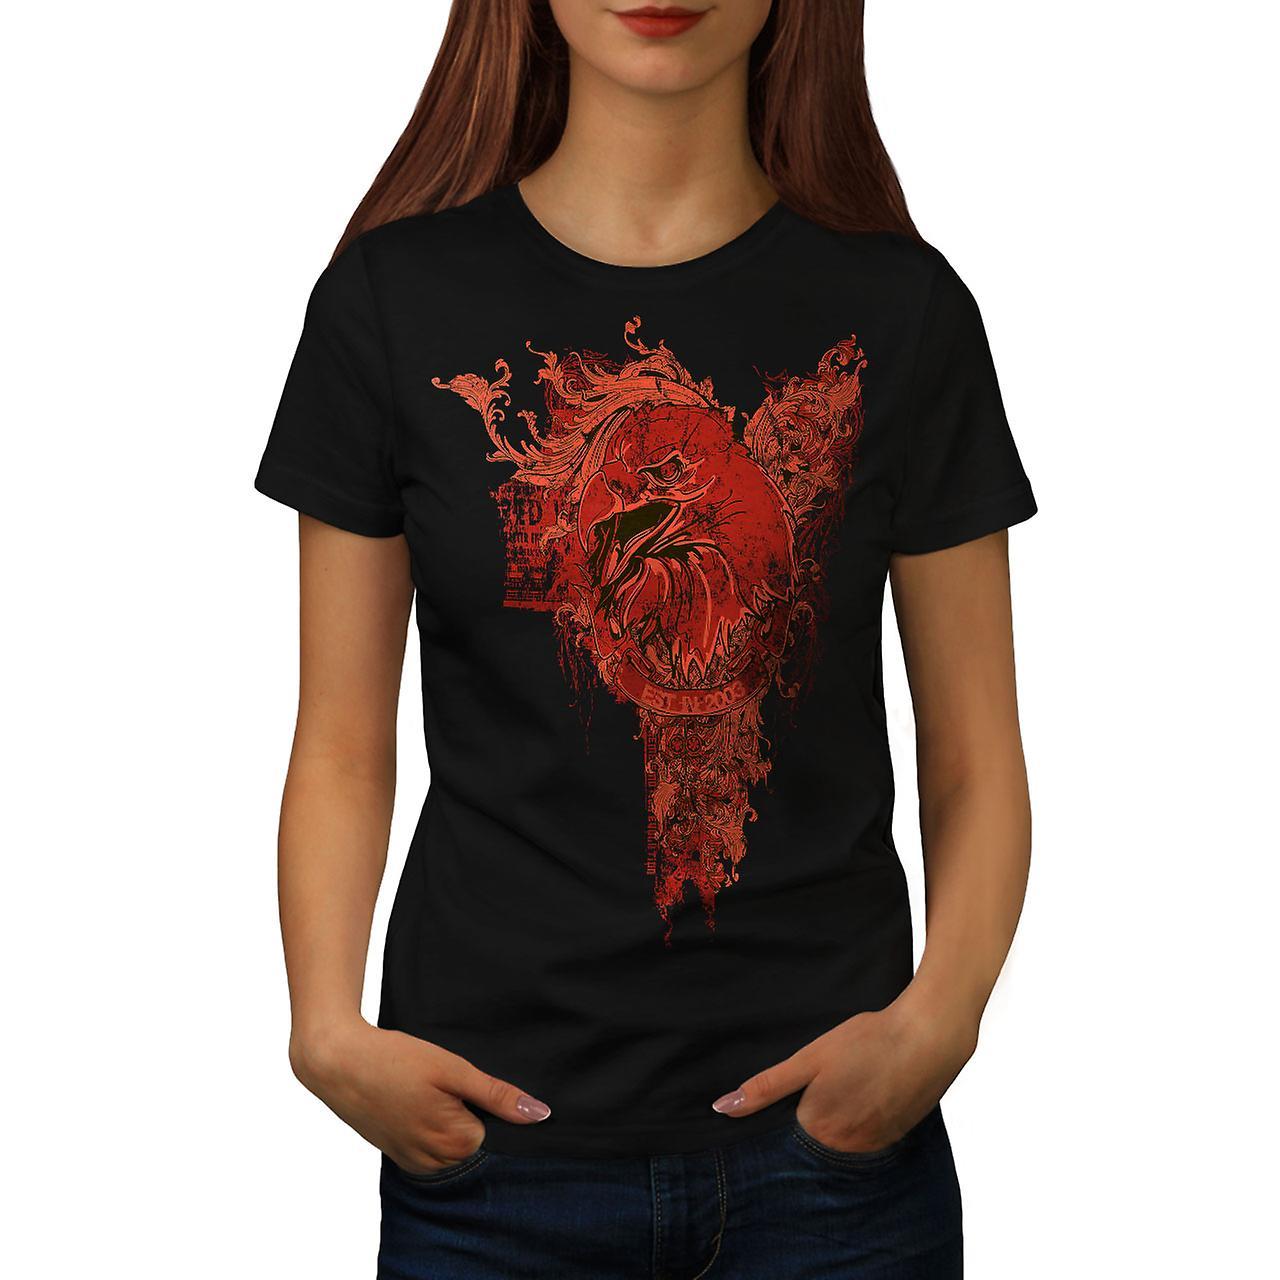 BlackT-chemise de Grim Reaper mort Vintage femme | Wellcoda